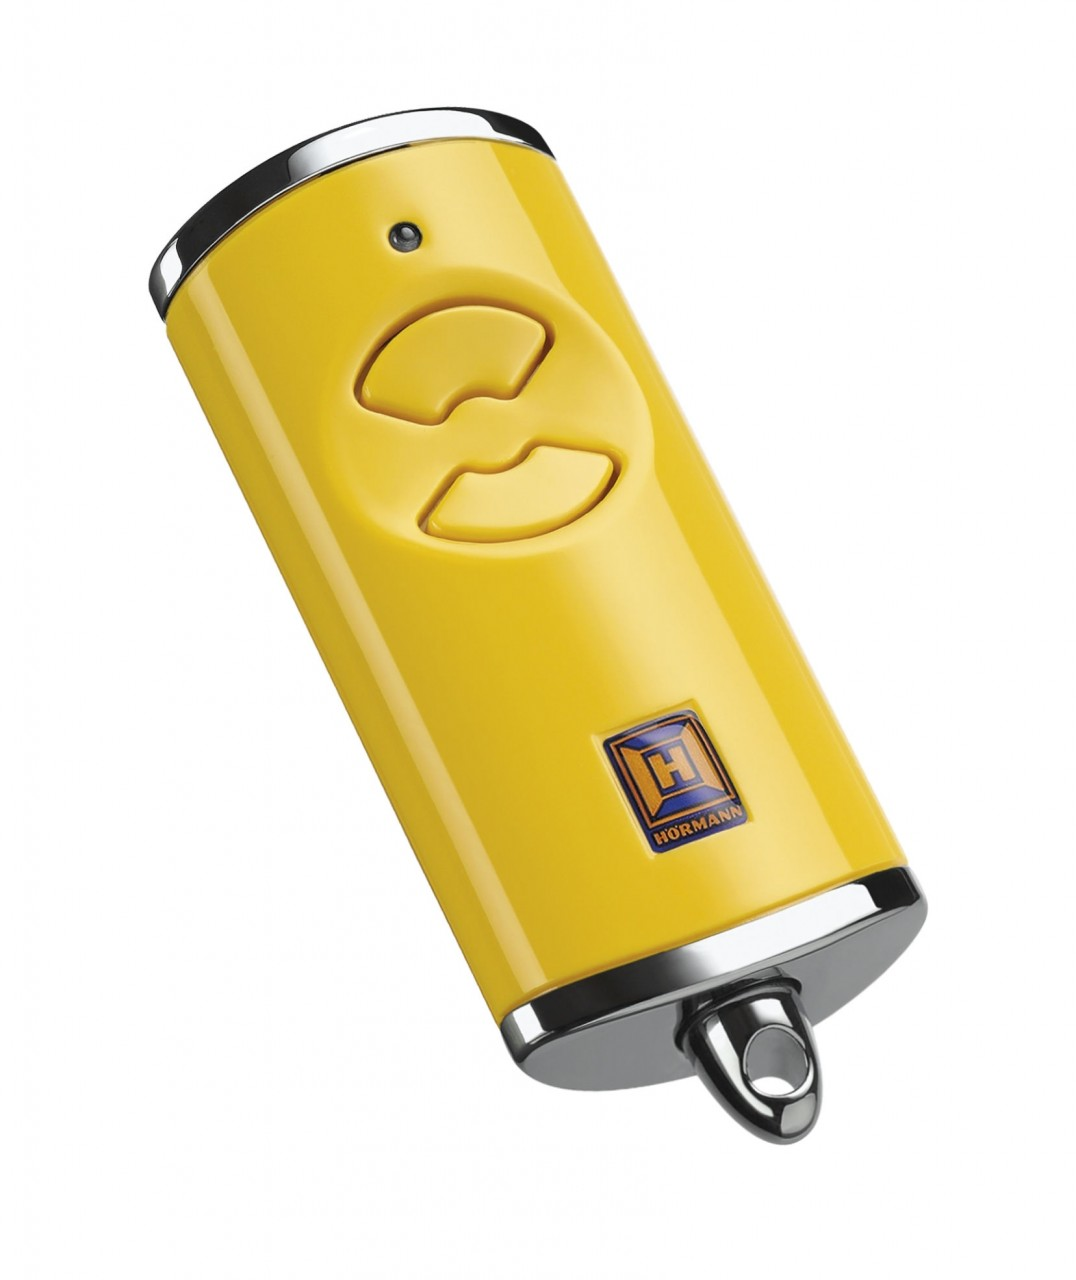 Hörmann Handsender HSE 2 868 MHz BiSecur gelb